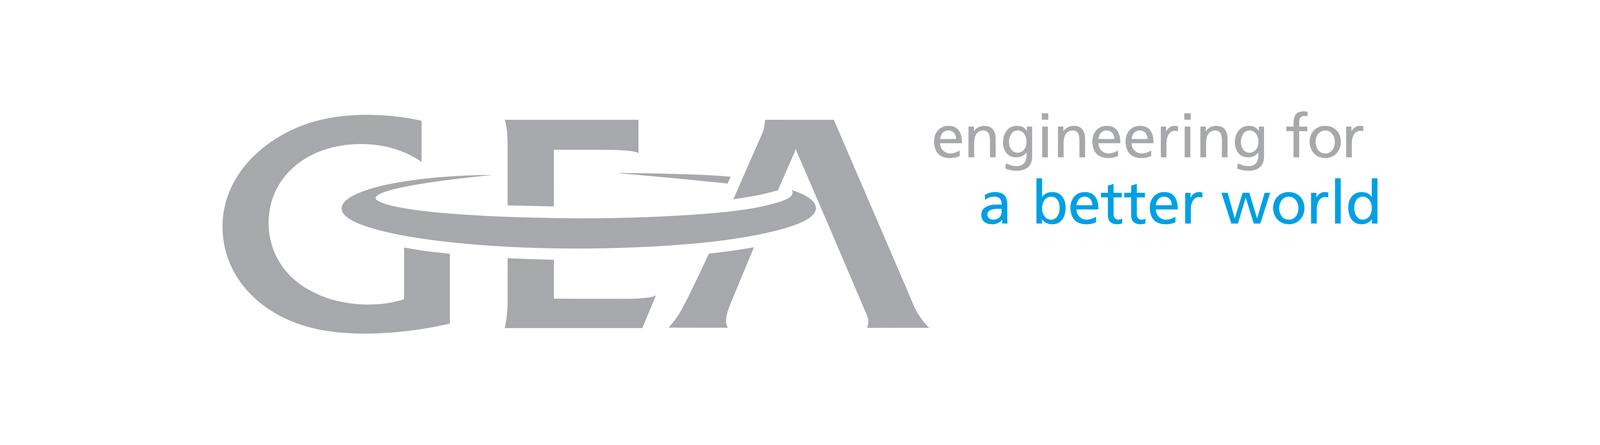 gea-logo.jpg